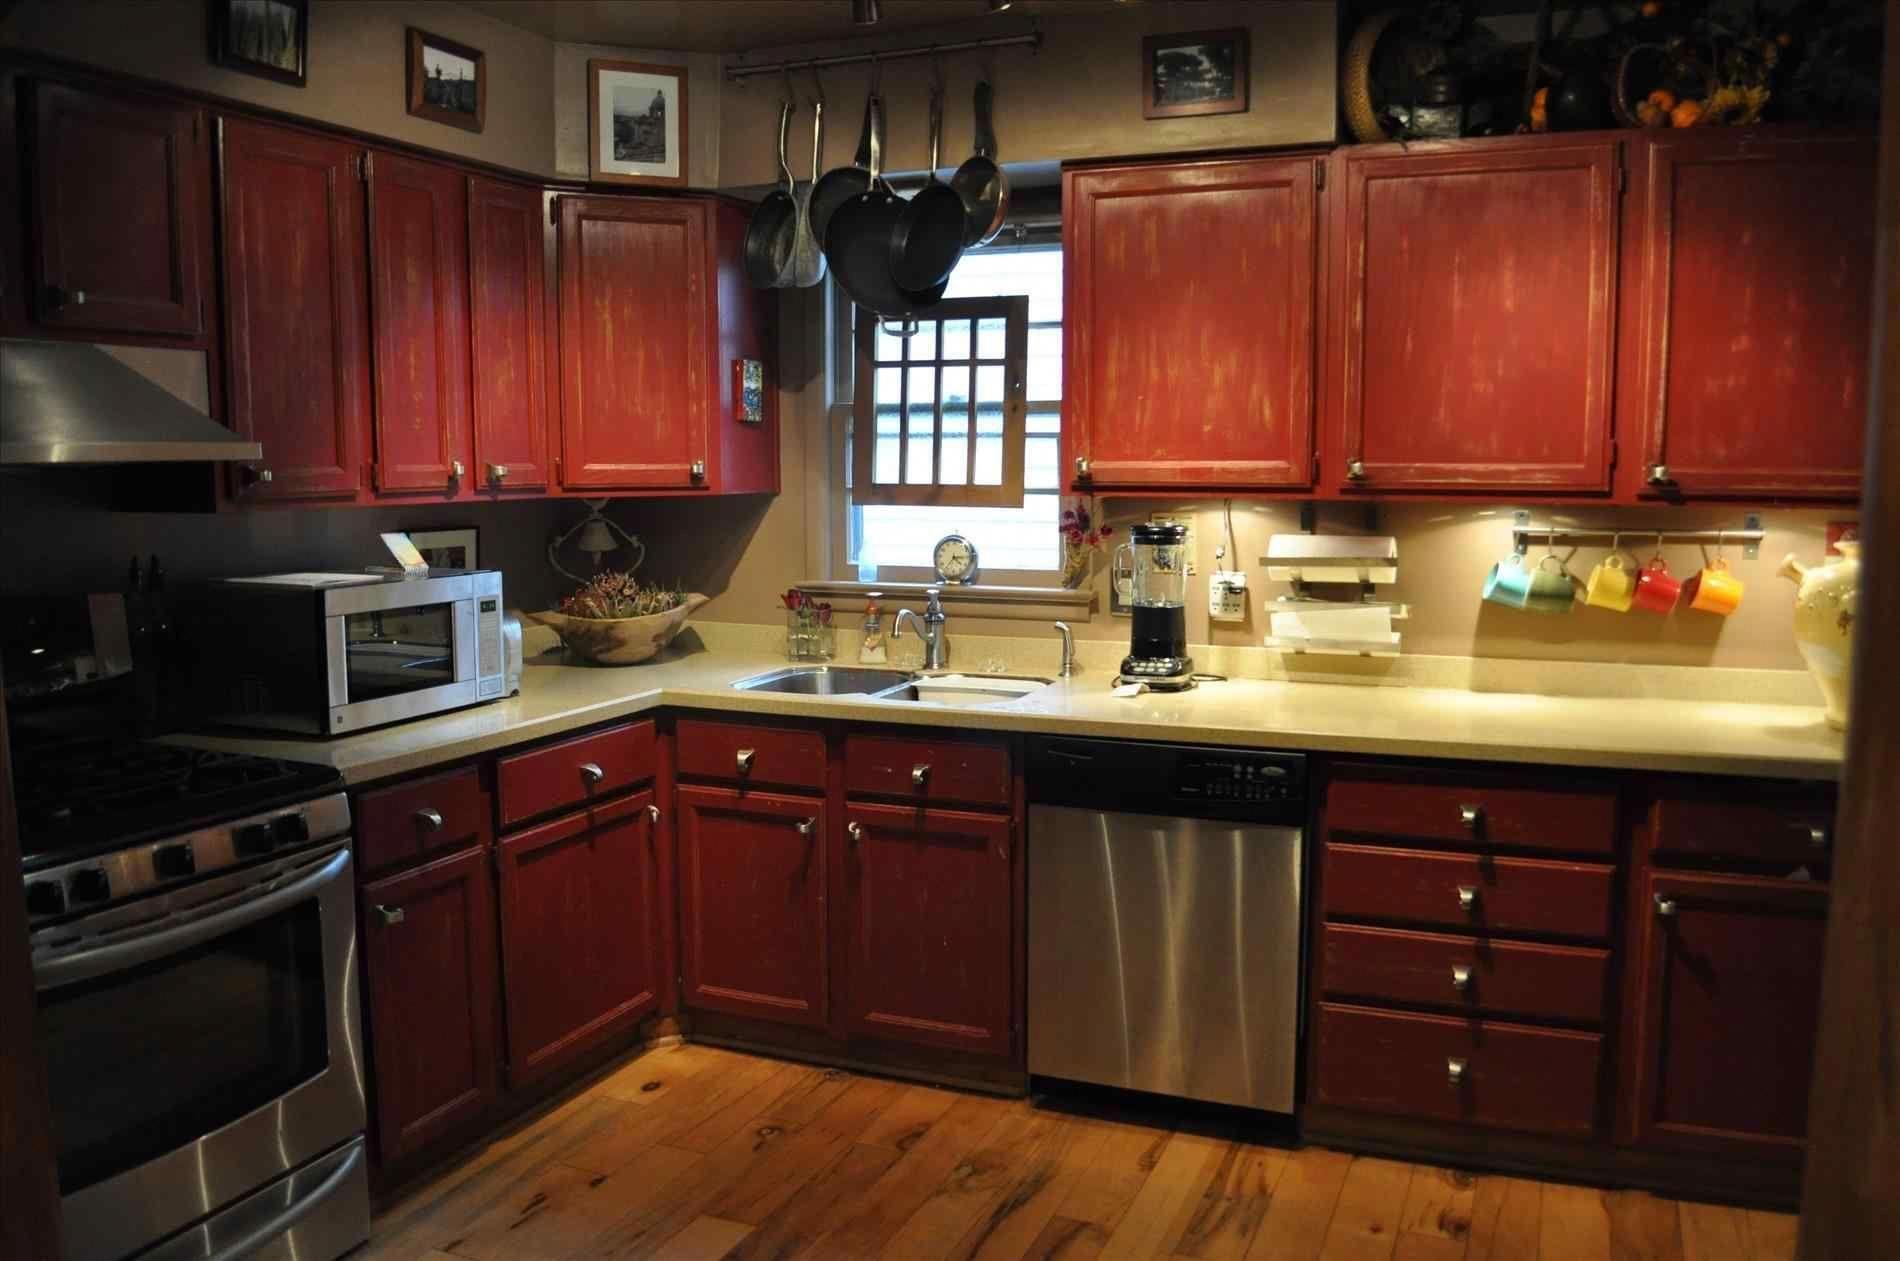 #kitchenfurnitureyellow | Wood kitchen cabinets ...